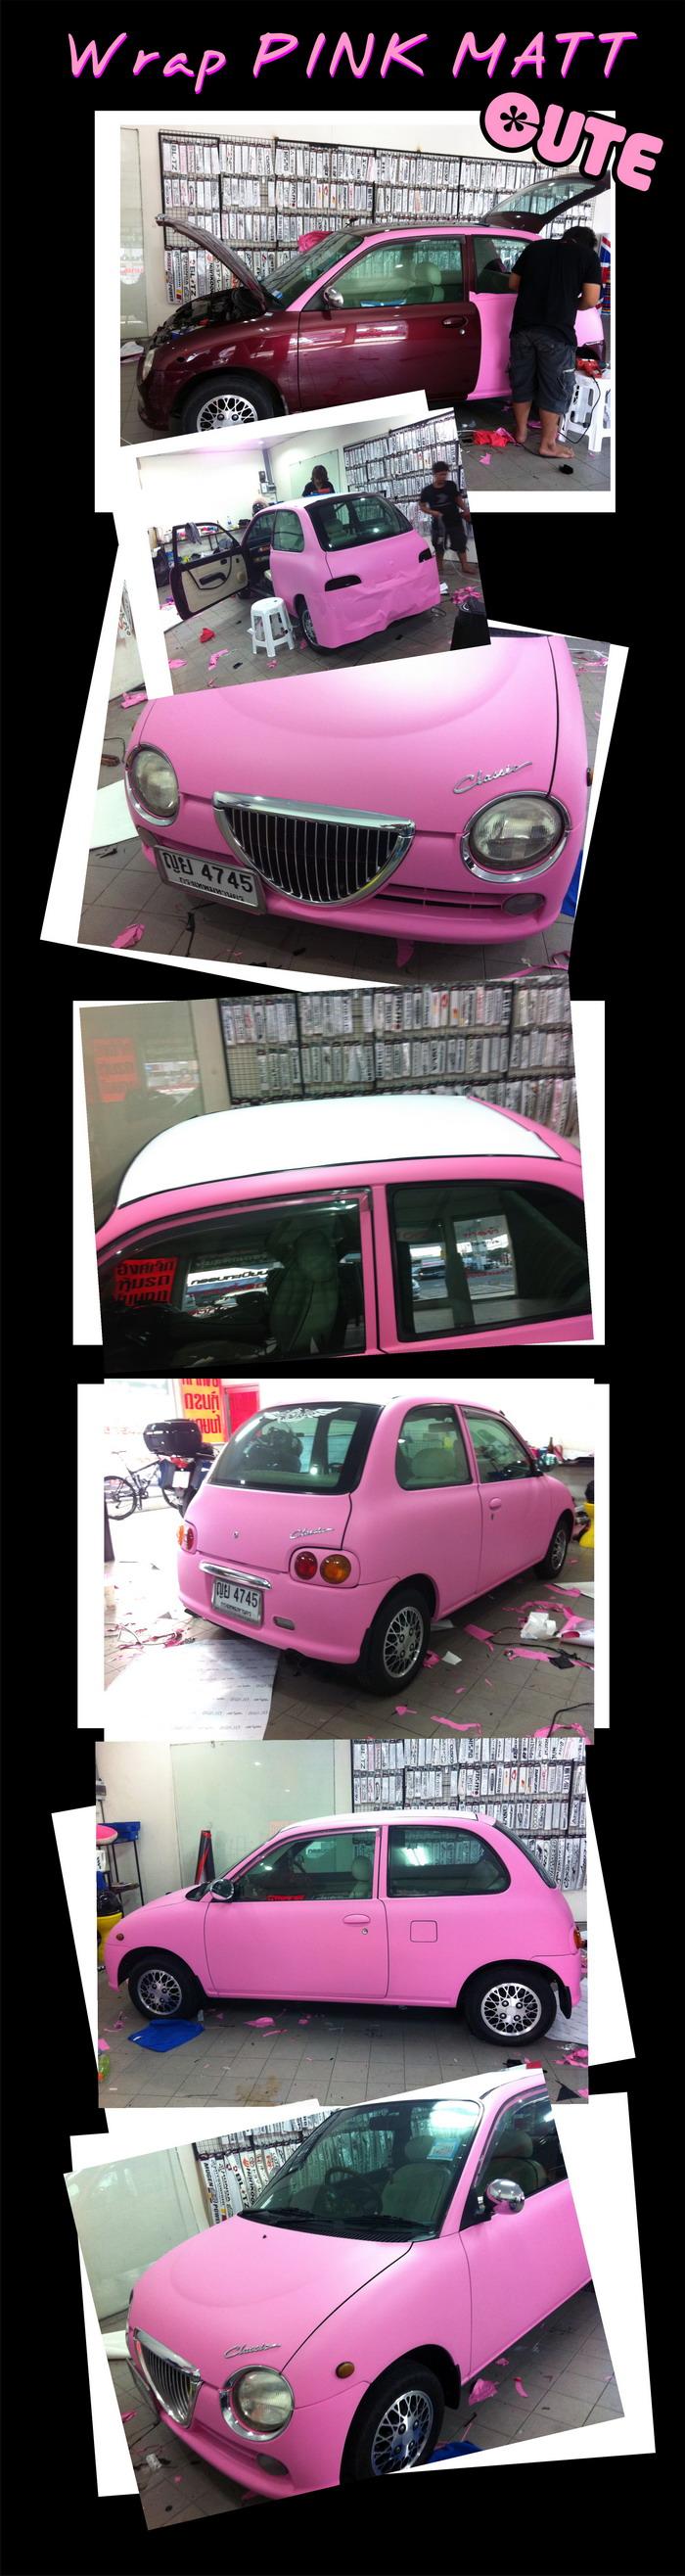 wrap car pink ฟิล์มหุ้มเปลี่ยนสีรถ เปลี่ยนสีรถทั้งคันด้วยสติกเกอร์ wrapเปลี่ยนสีรถ เปลี่ยนสีรถดำด้าน